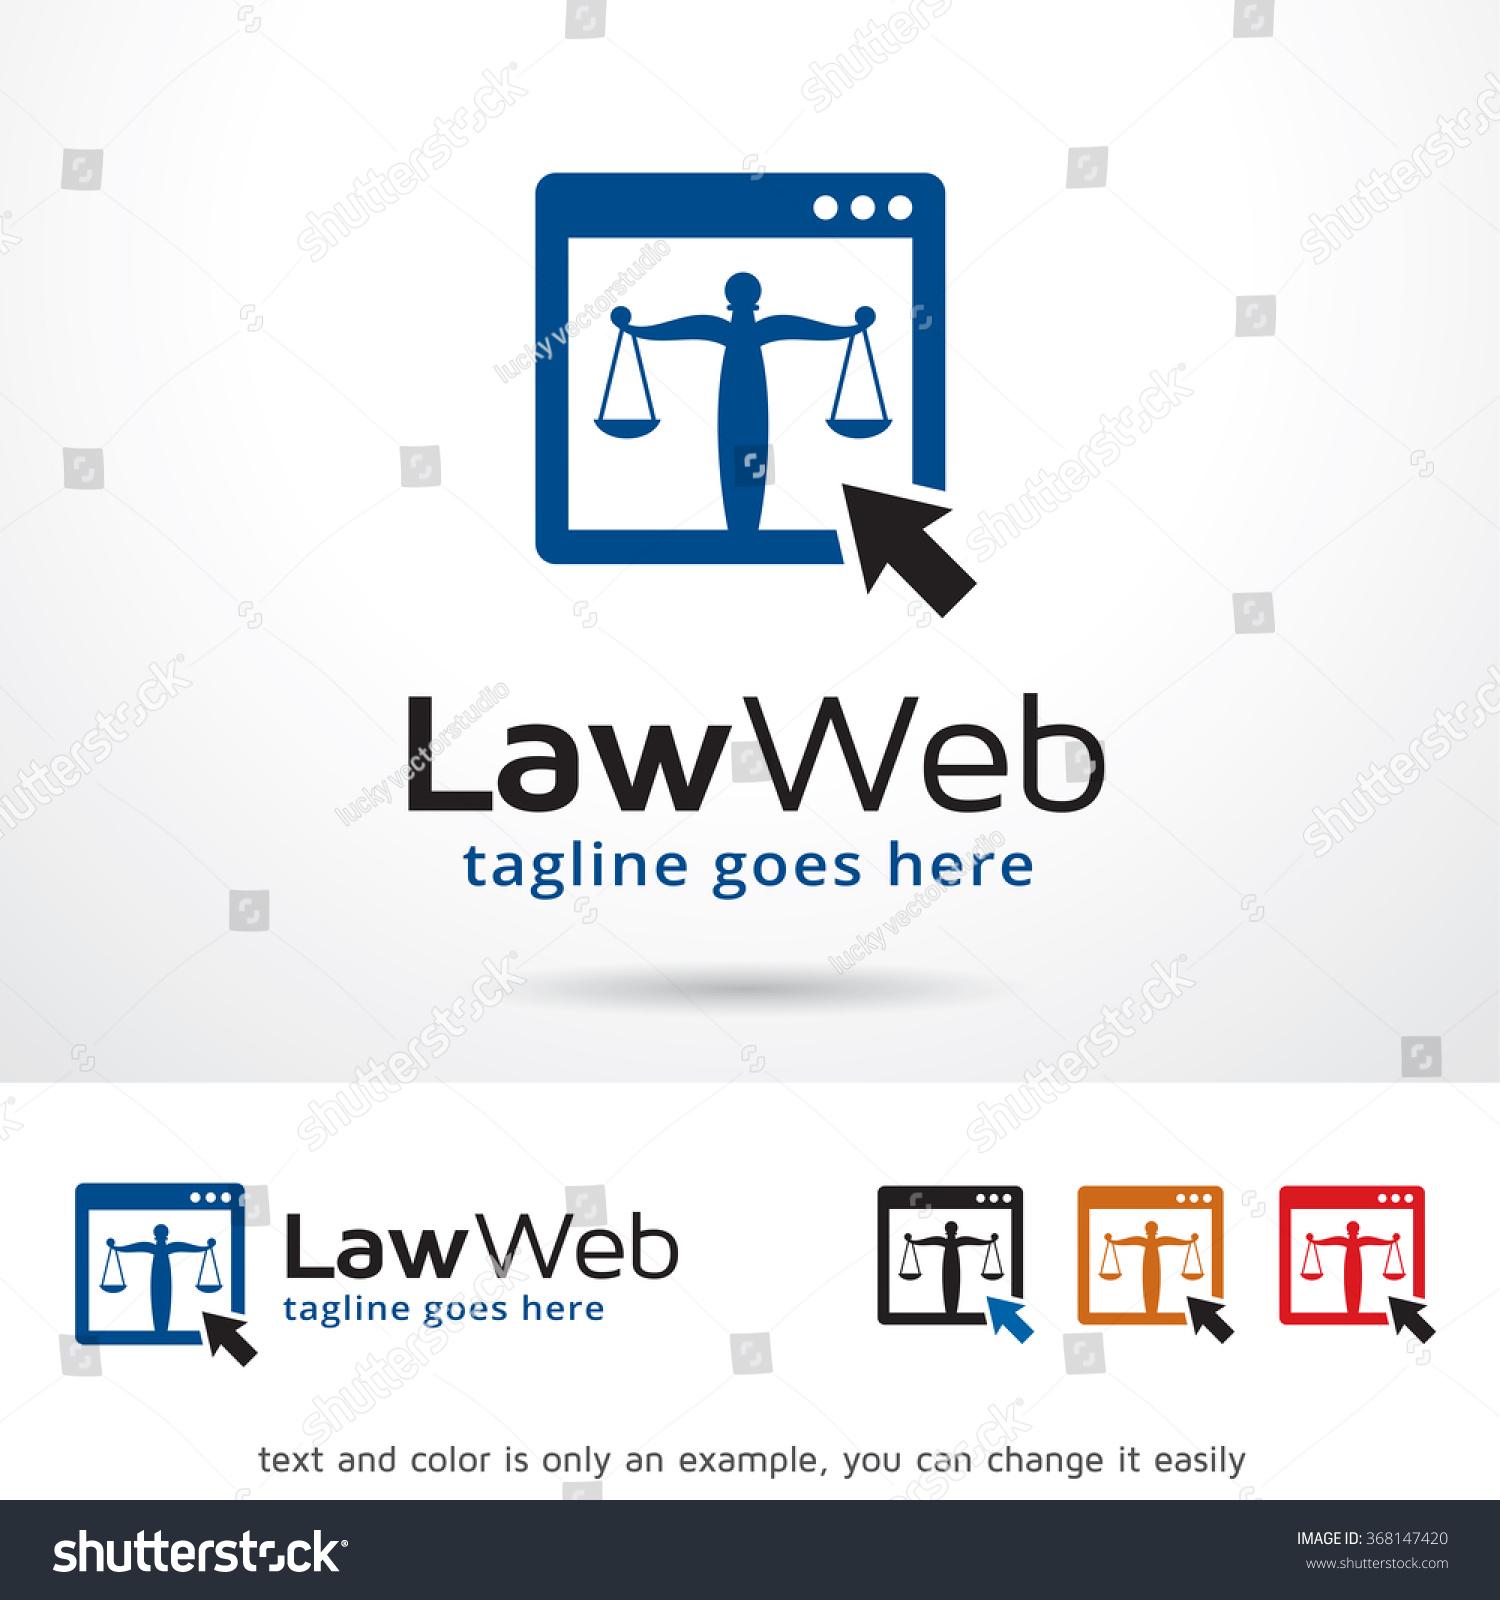 law web logo template design vector 368147420 shutterstock. Black Bedroom Furniture Sets. Home Design Ideas